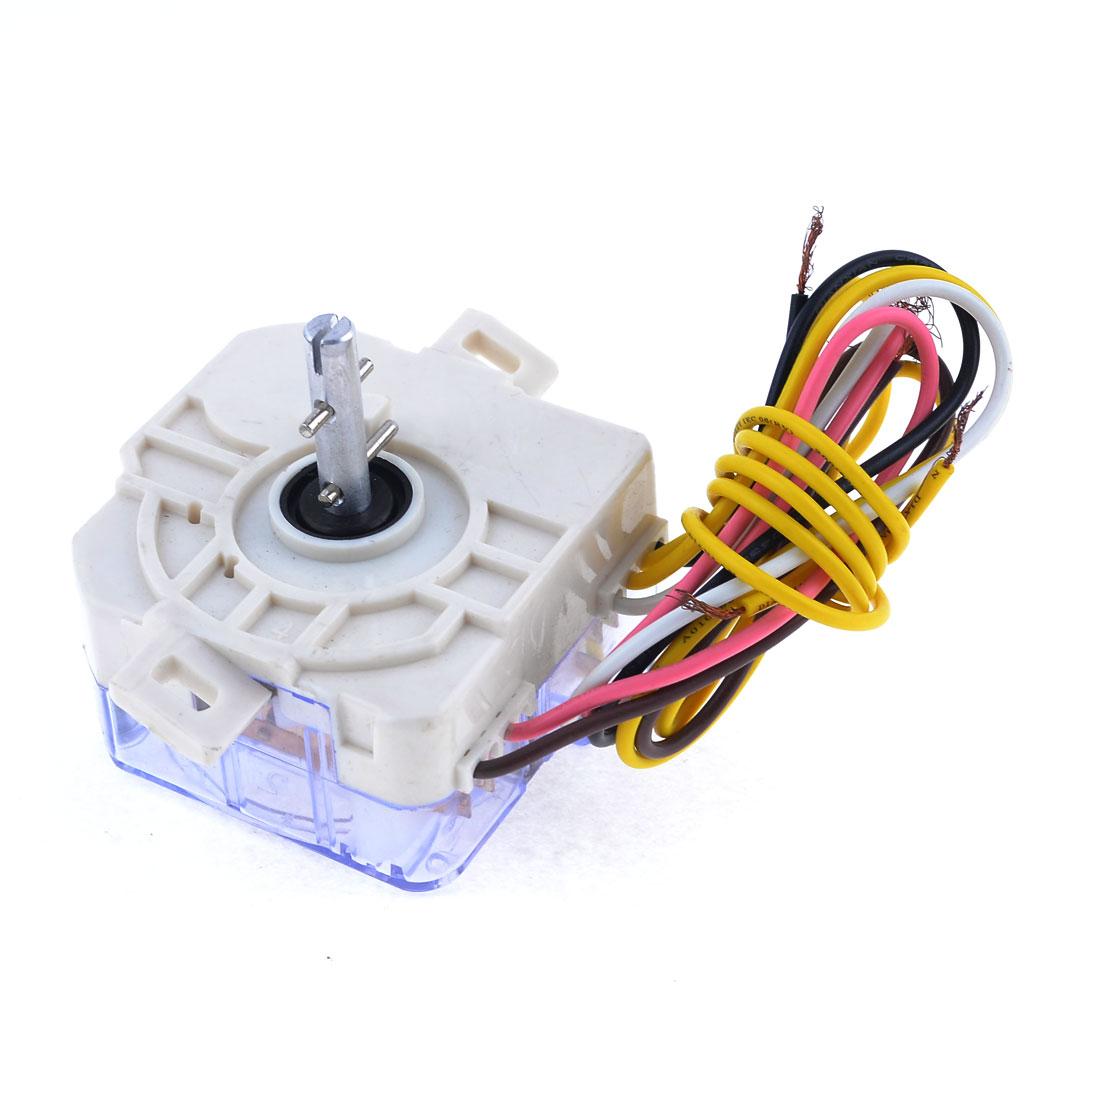 AC 250V 3A 6 Wire Single Shaft Washing Machine Washer Timer White